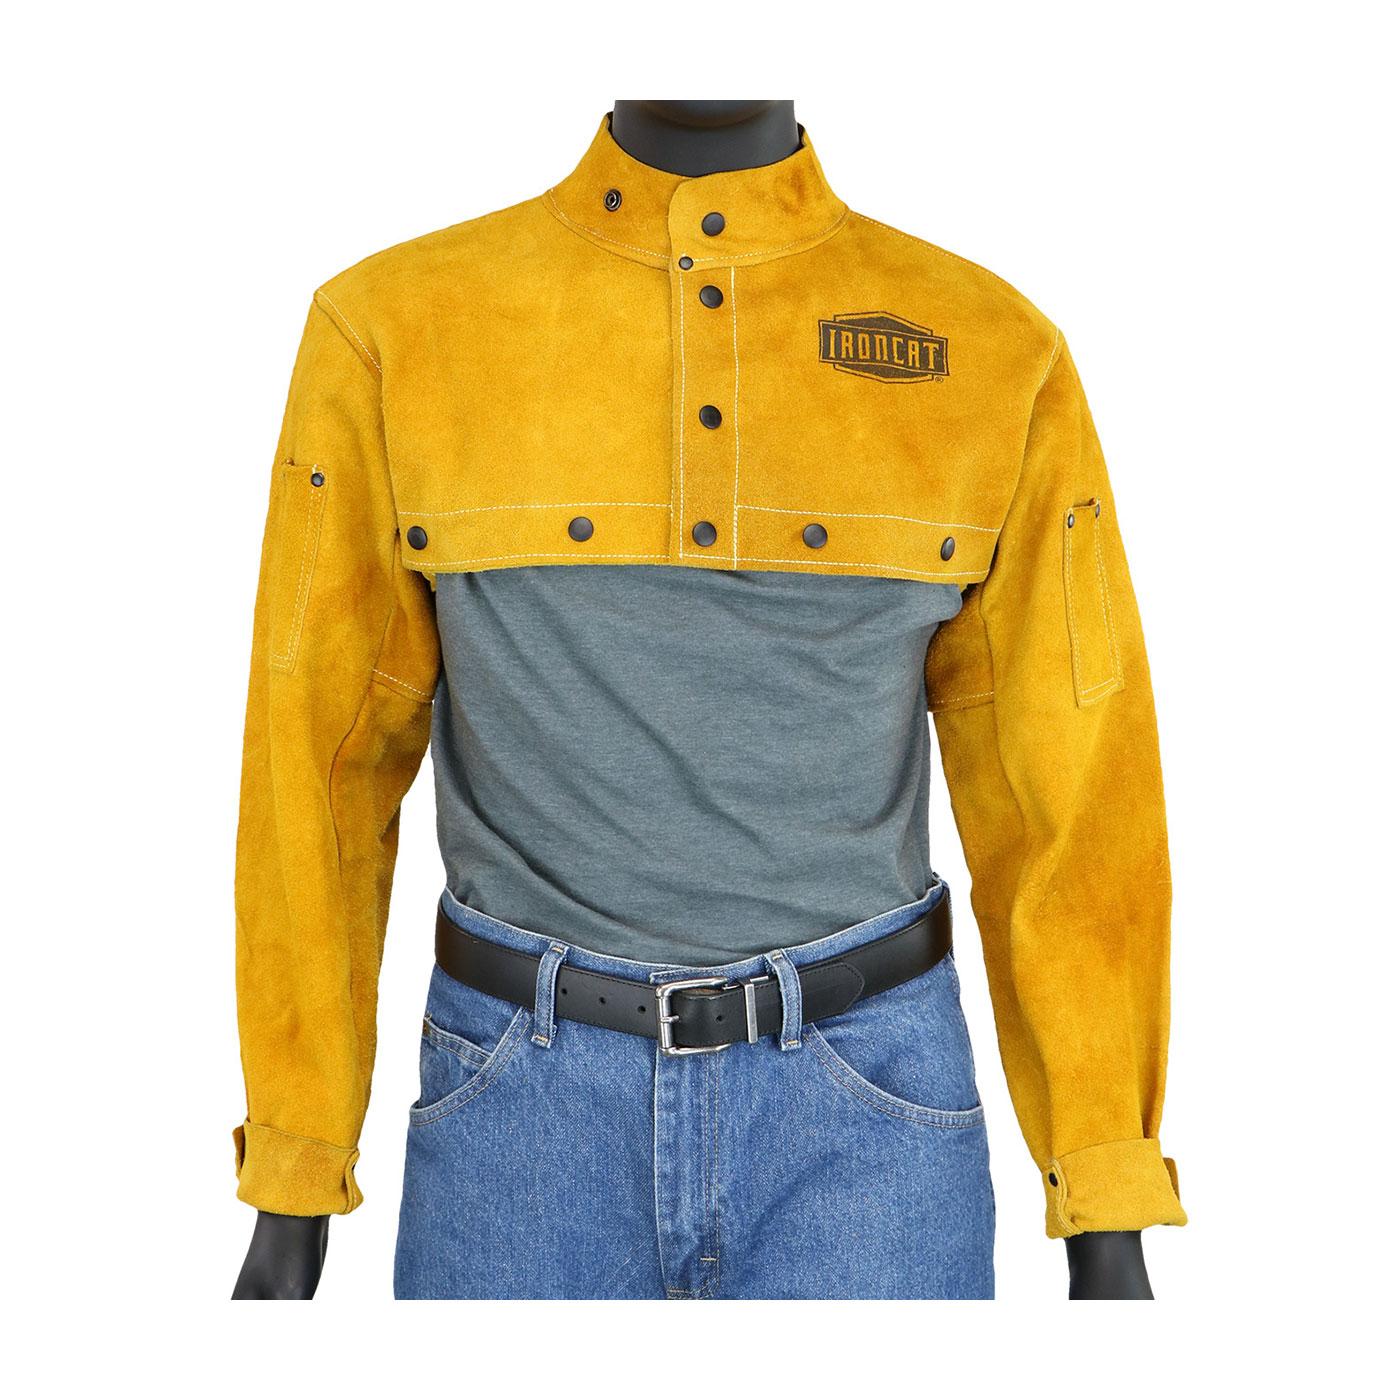 Ironcat® Split Leather Welding Cape Sleeve, Gold, 2XL